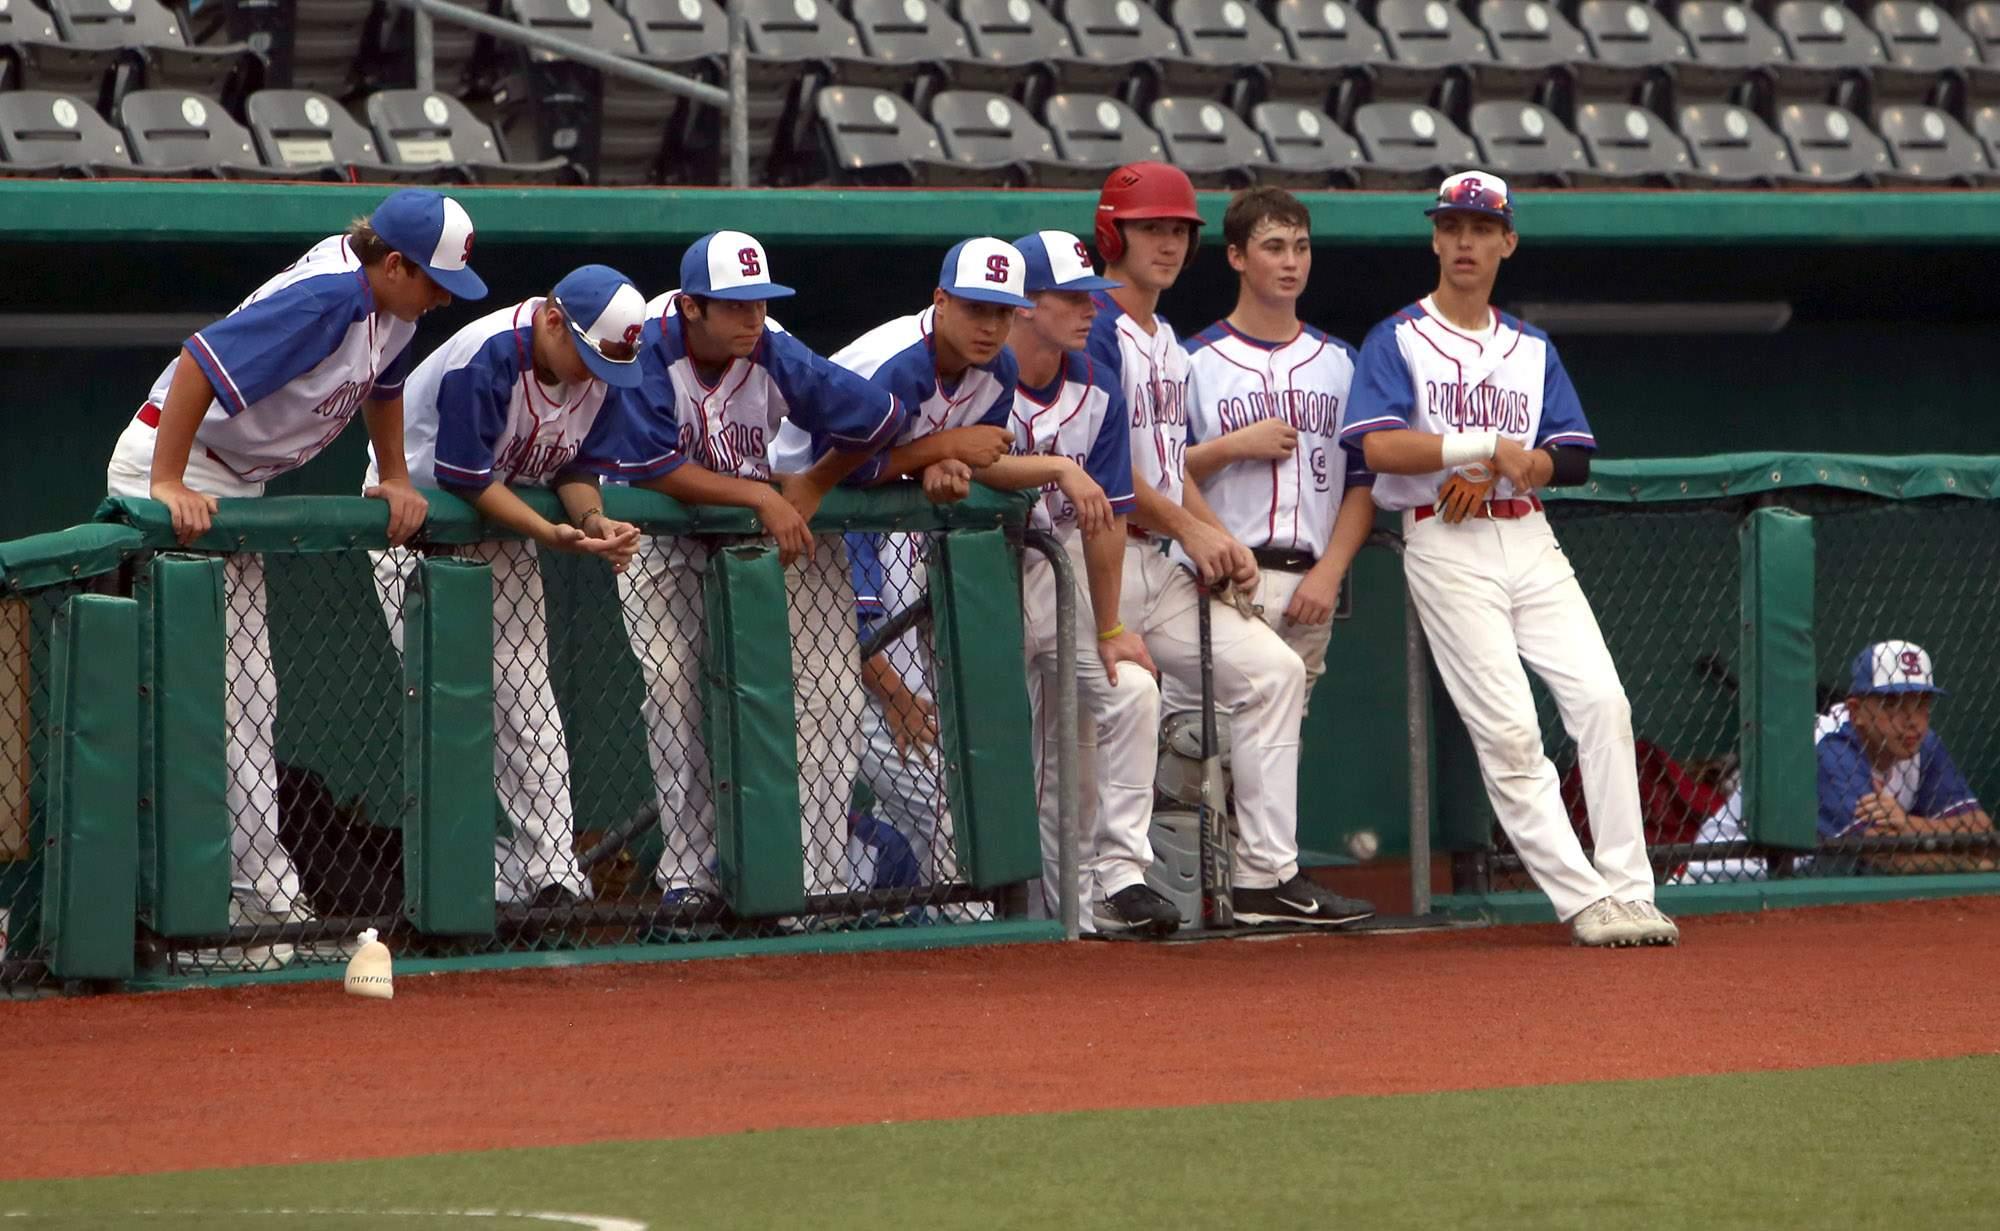 Team Southern Illinois